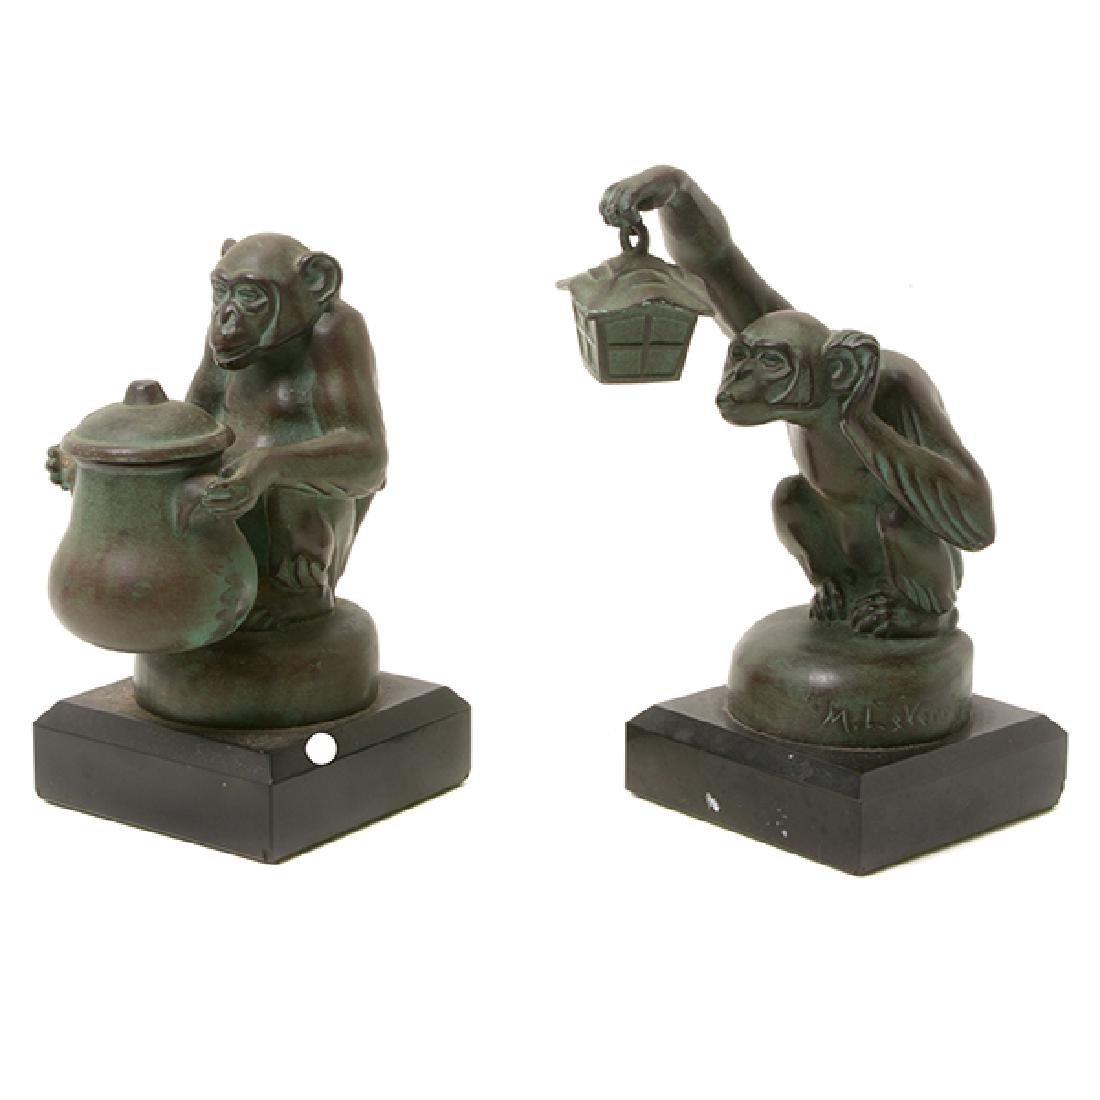 Pair of Bronze Monkey Figures, After M. LeVerrier